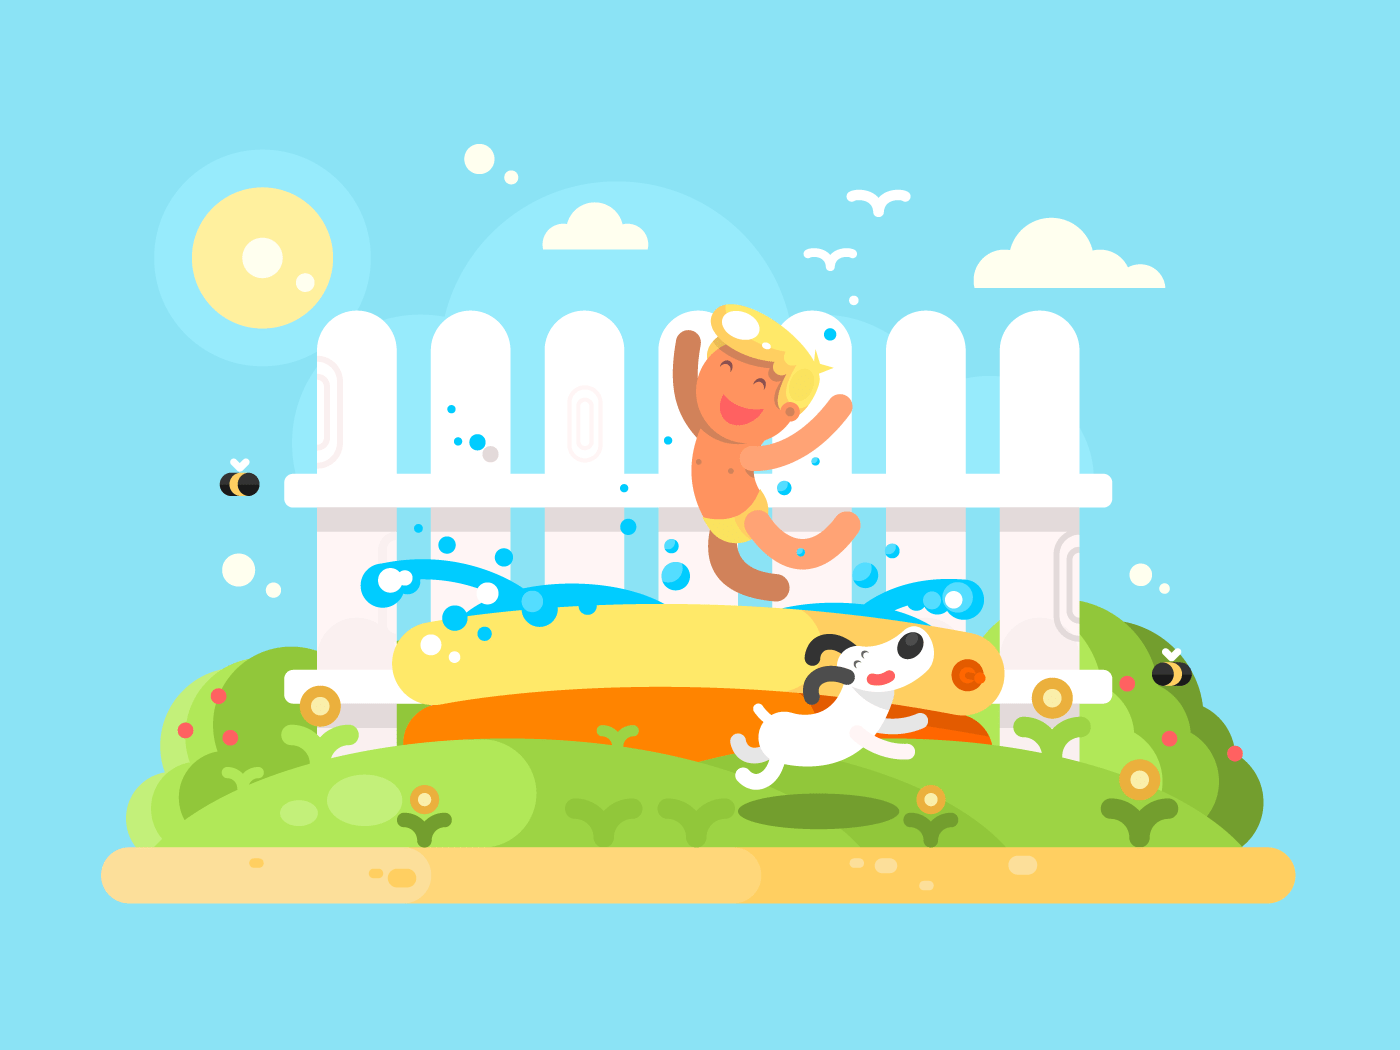 Little boy in garden pool having fun flat vector illustration